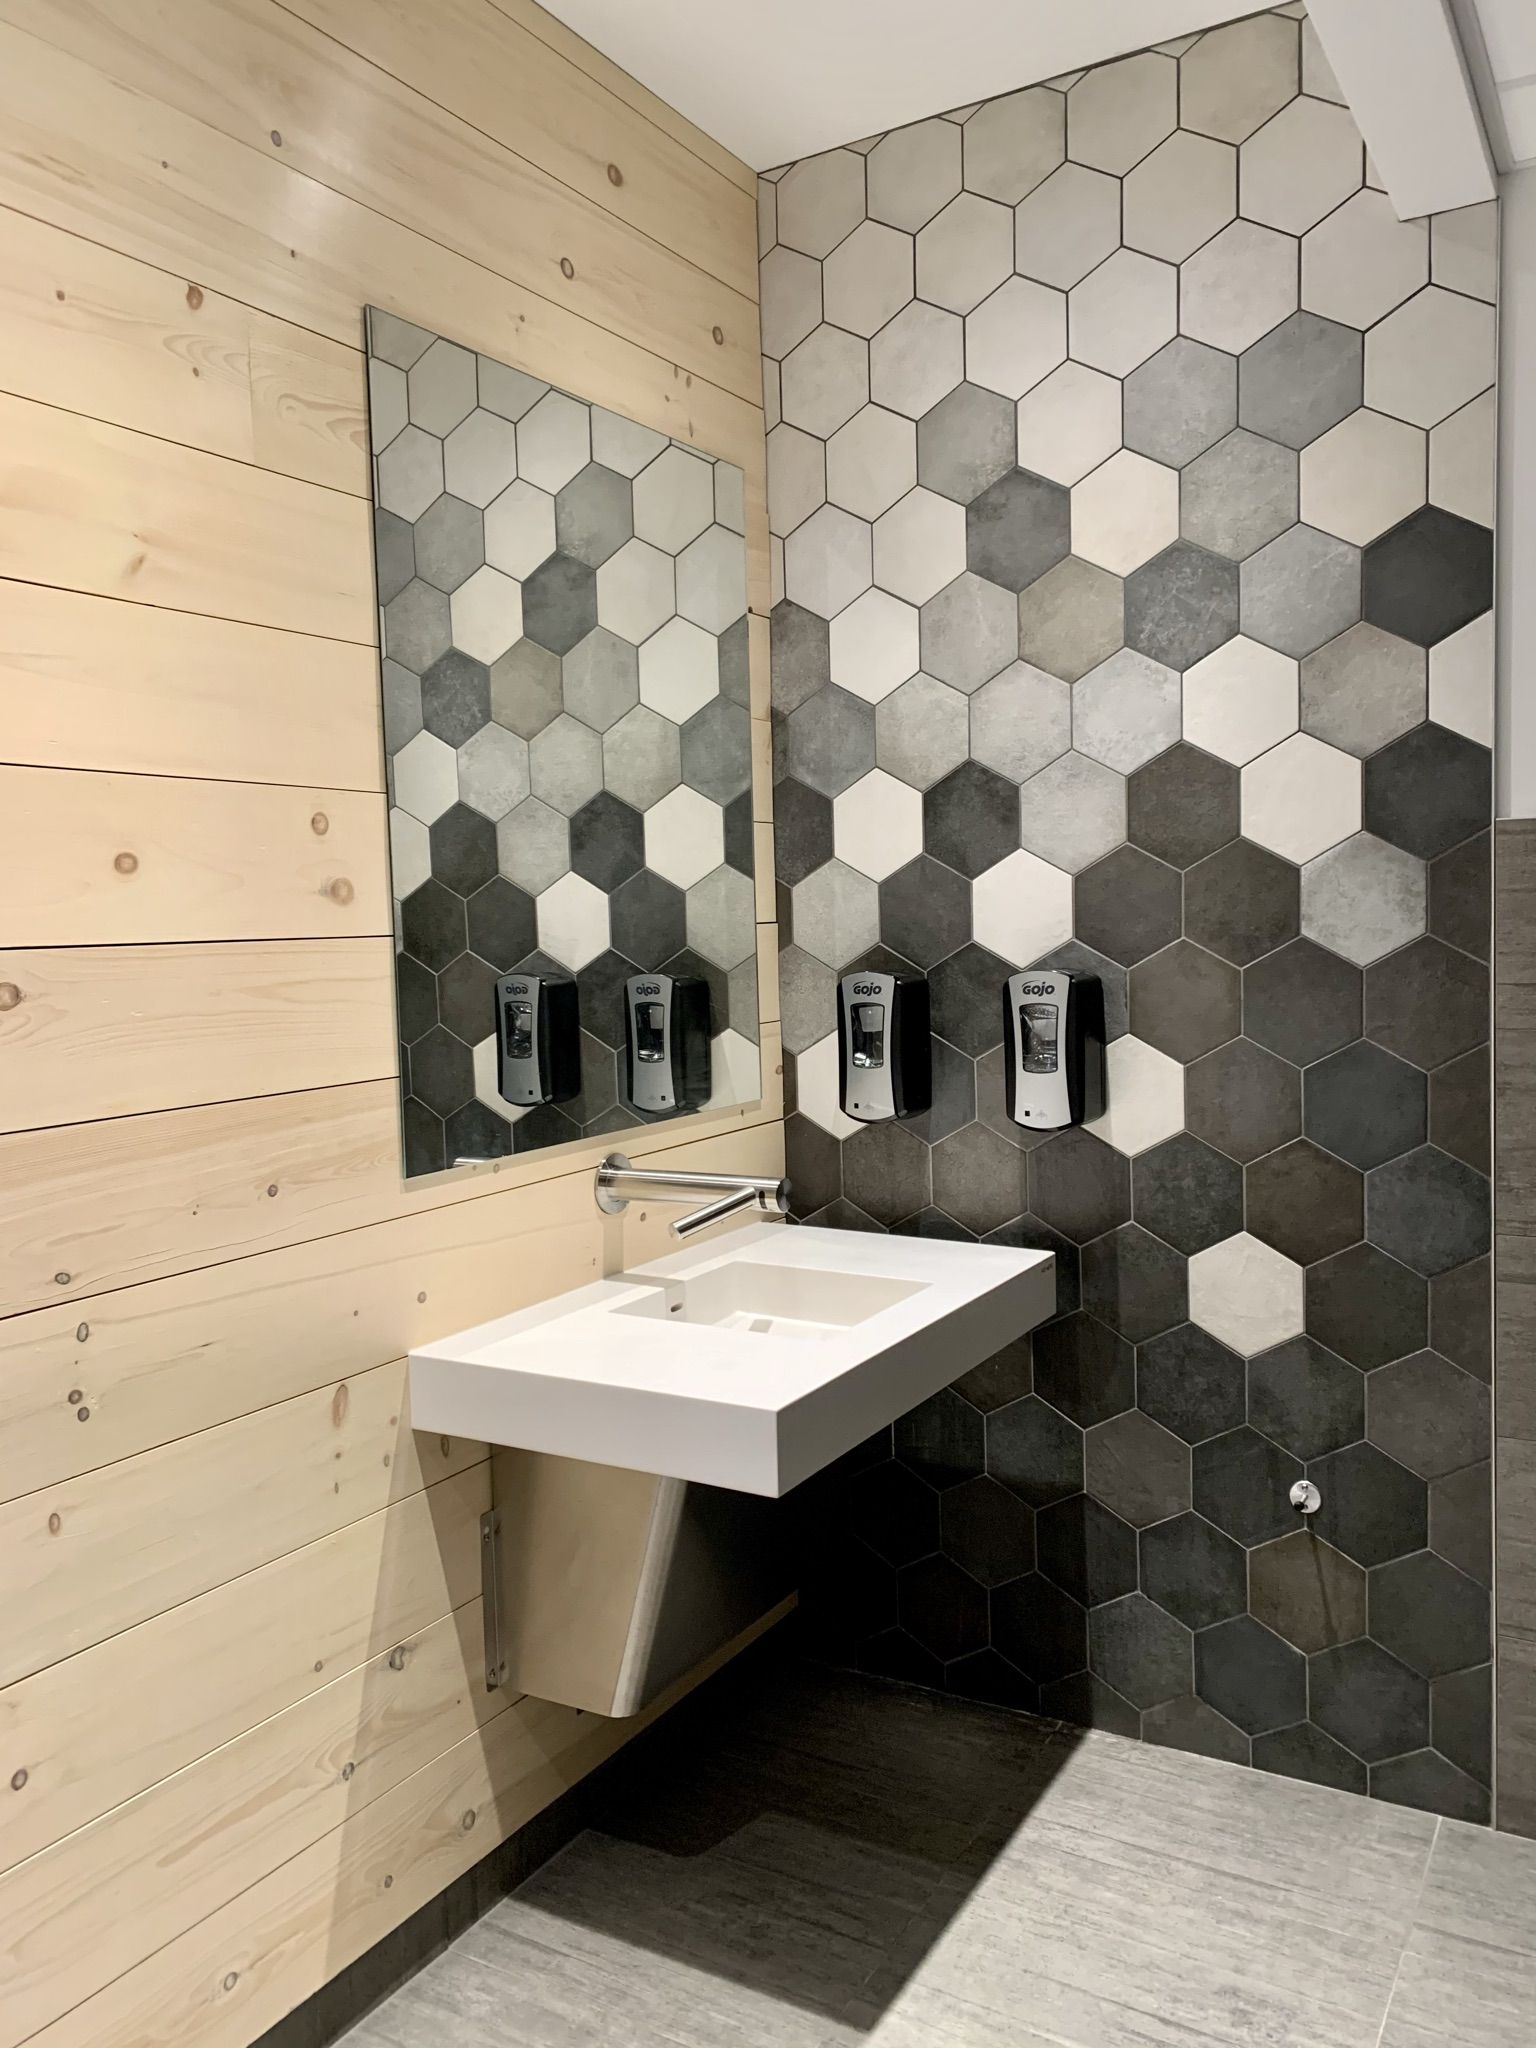 Réalisation commercial Relais Petro-Canada salle de bain Struktura 2021